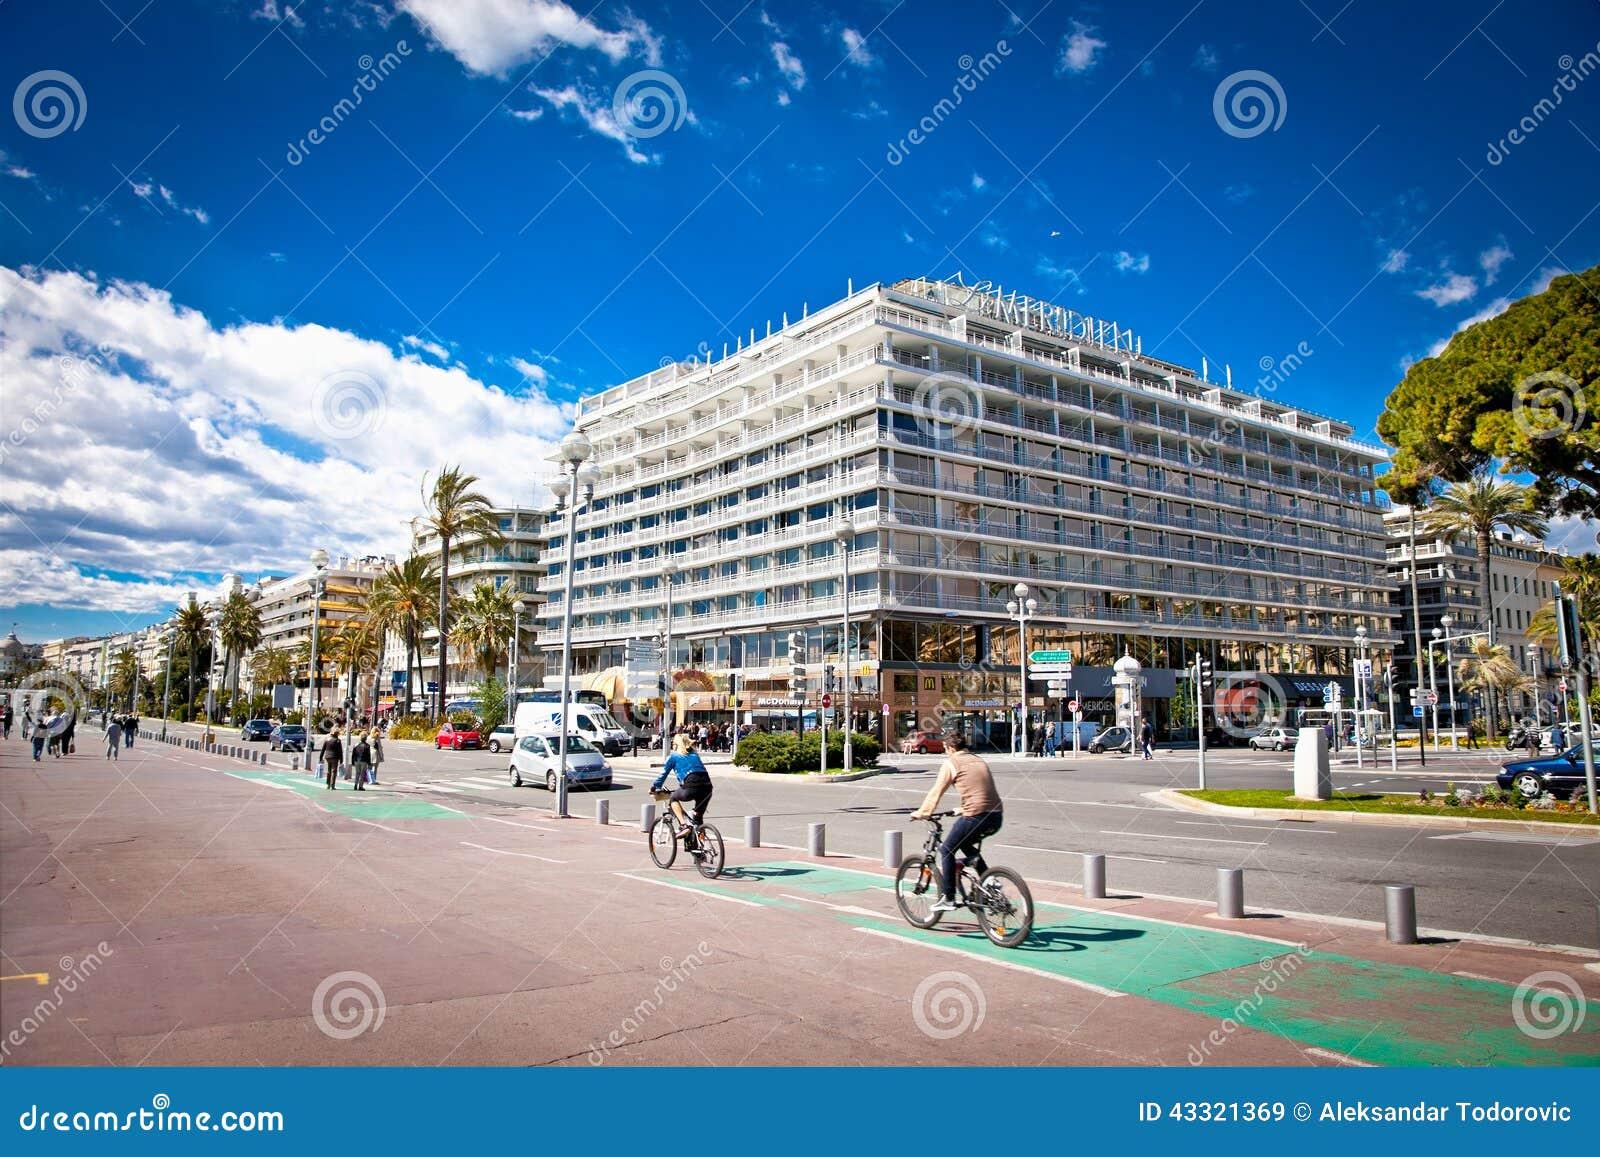 Luxury hotel le meridien in nice france editorial stock for Luxury hotels in nice